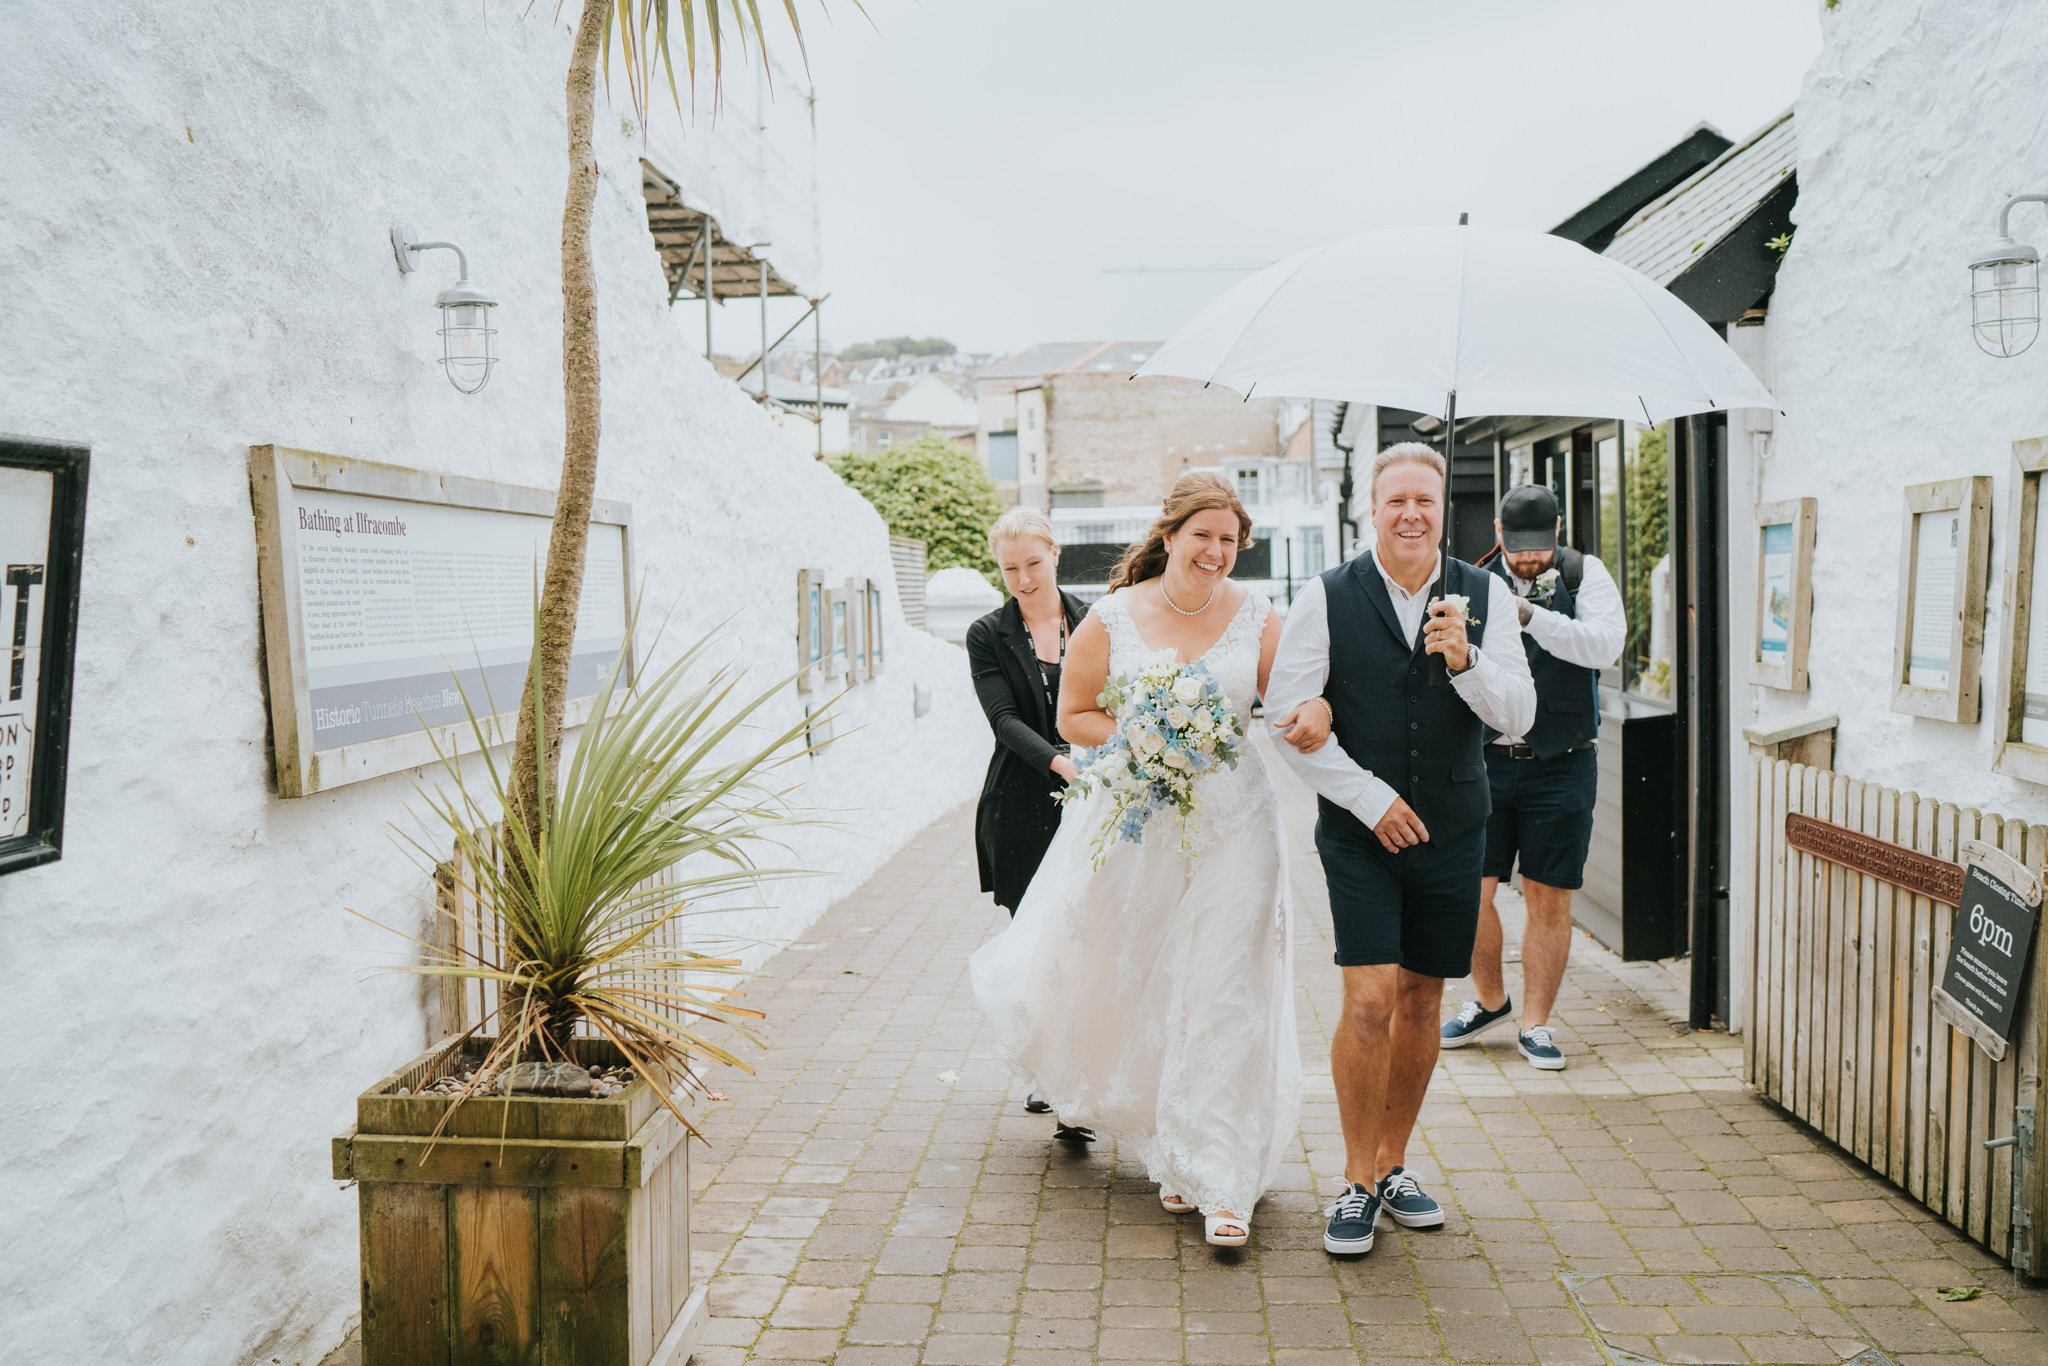 john-amy-relaxed-beach-wedding-tunnels-beaches-ilfracombe-north-devon-grace-elizabeth-colchester-essex-alternative-relaxed-wedding-photography-devon-suffolk-norfolk-essex (45 of 159).jpg